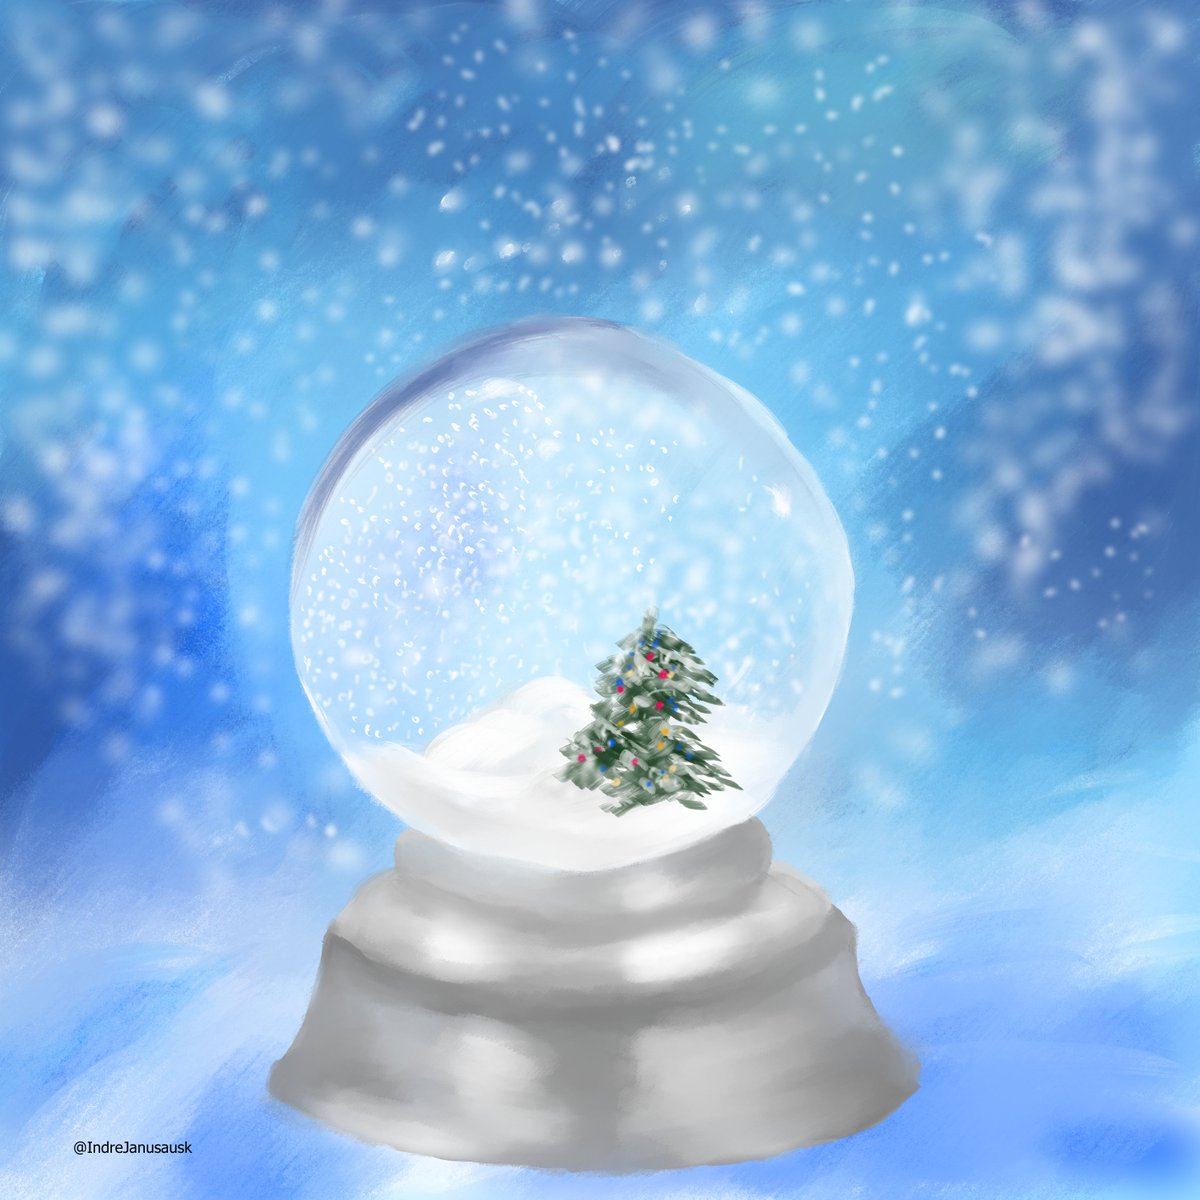 Day 6 Snow a little bit late#DechartDecember #ConnorArmy #DechartGamespic.twitter.com/oEDWeAc8tC